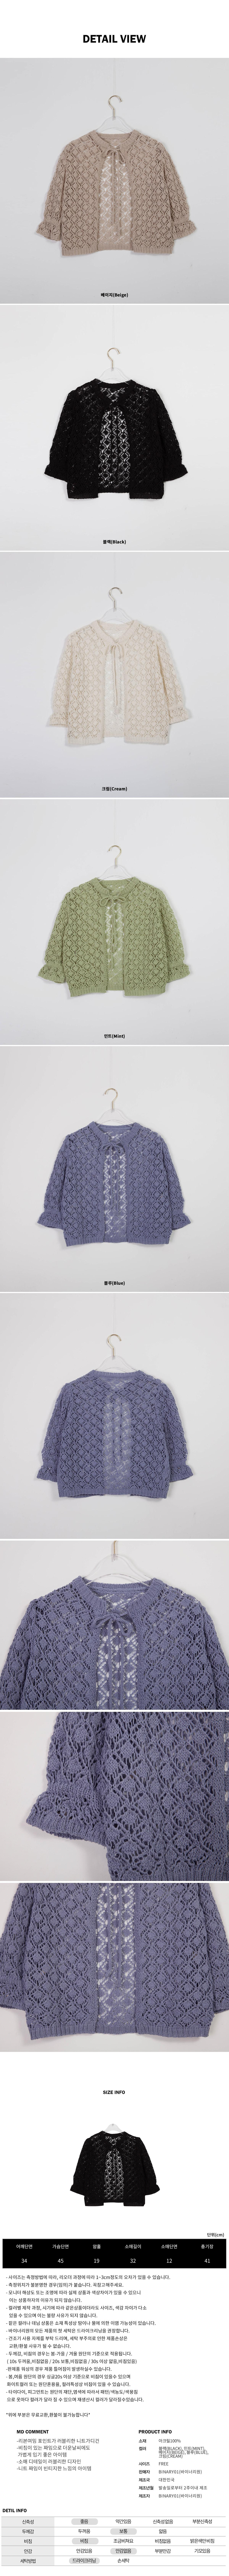 Ribbon Gel Knitwear Cardigan